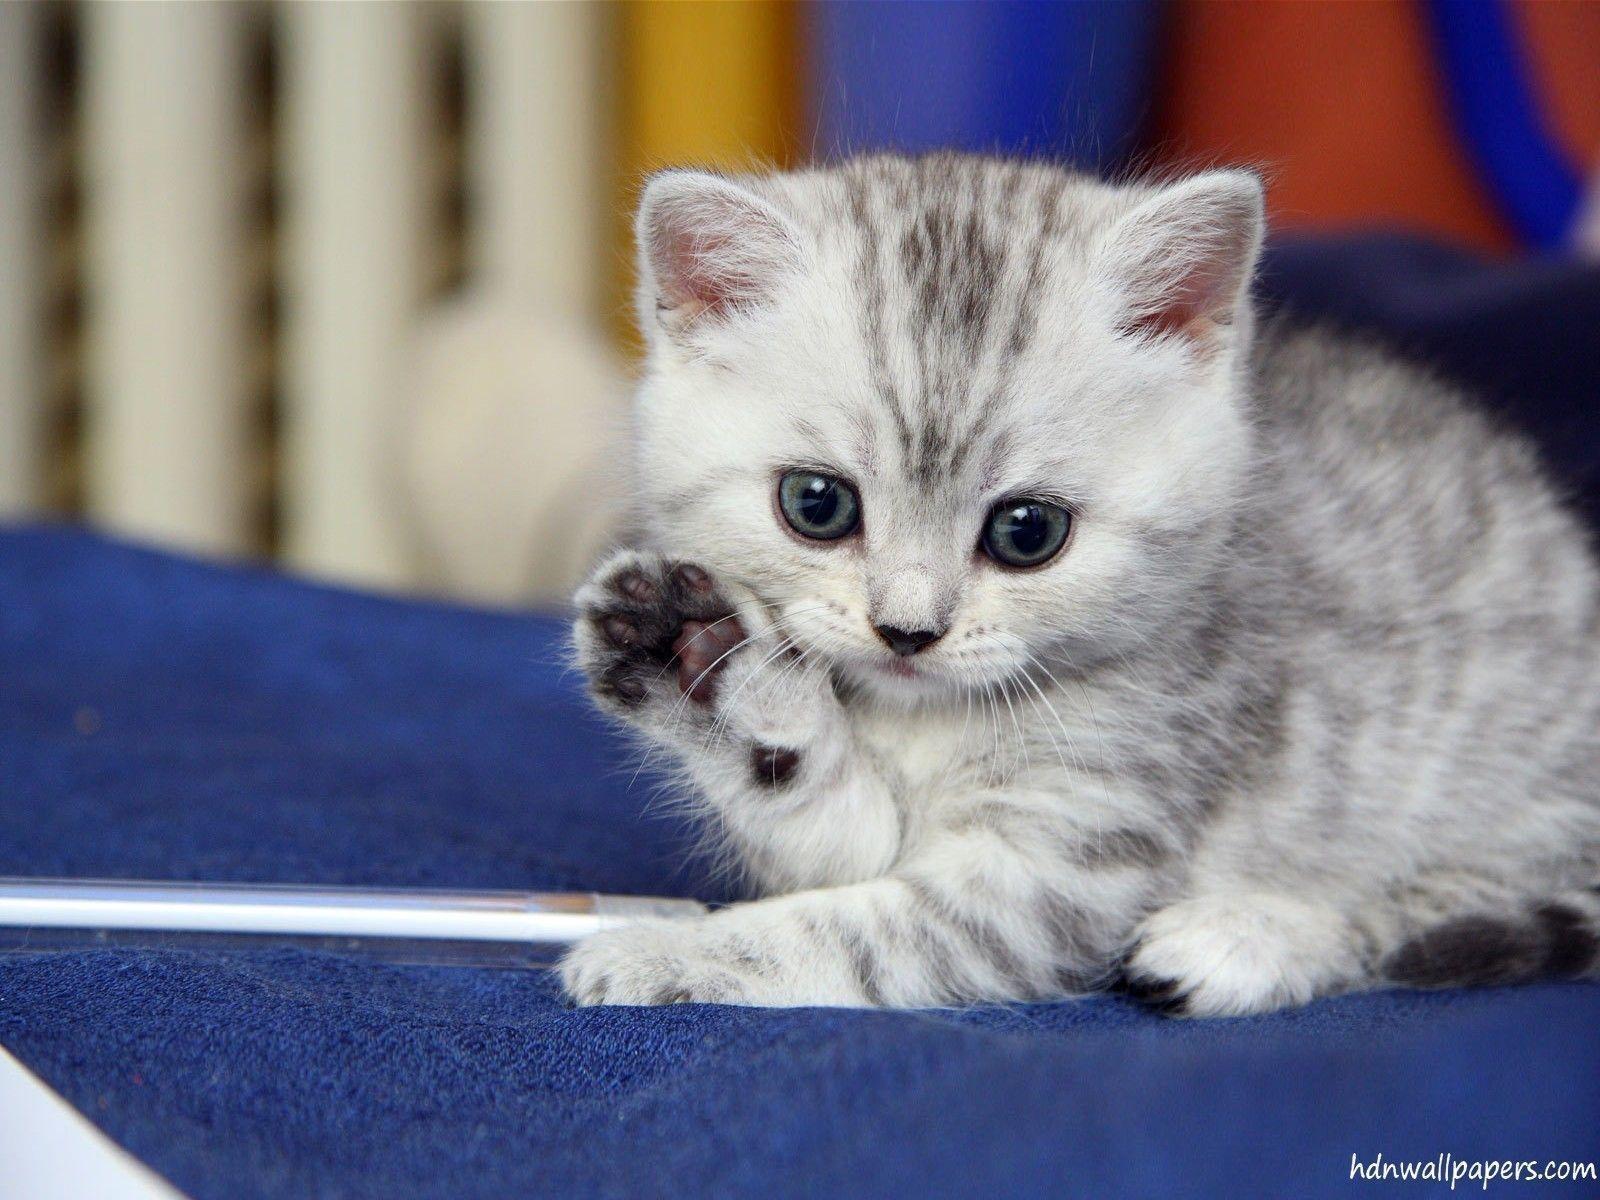 free cute kitten wallpapers - wallpaper cave